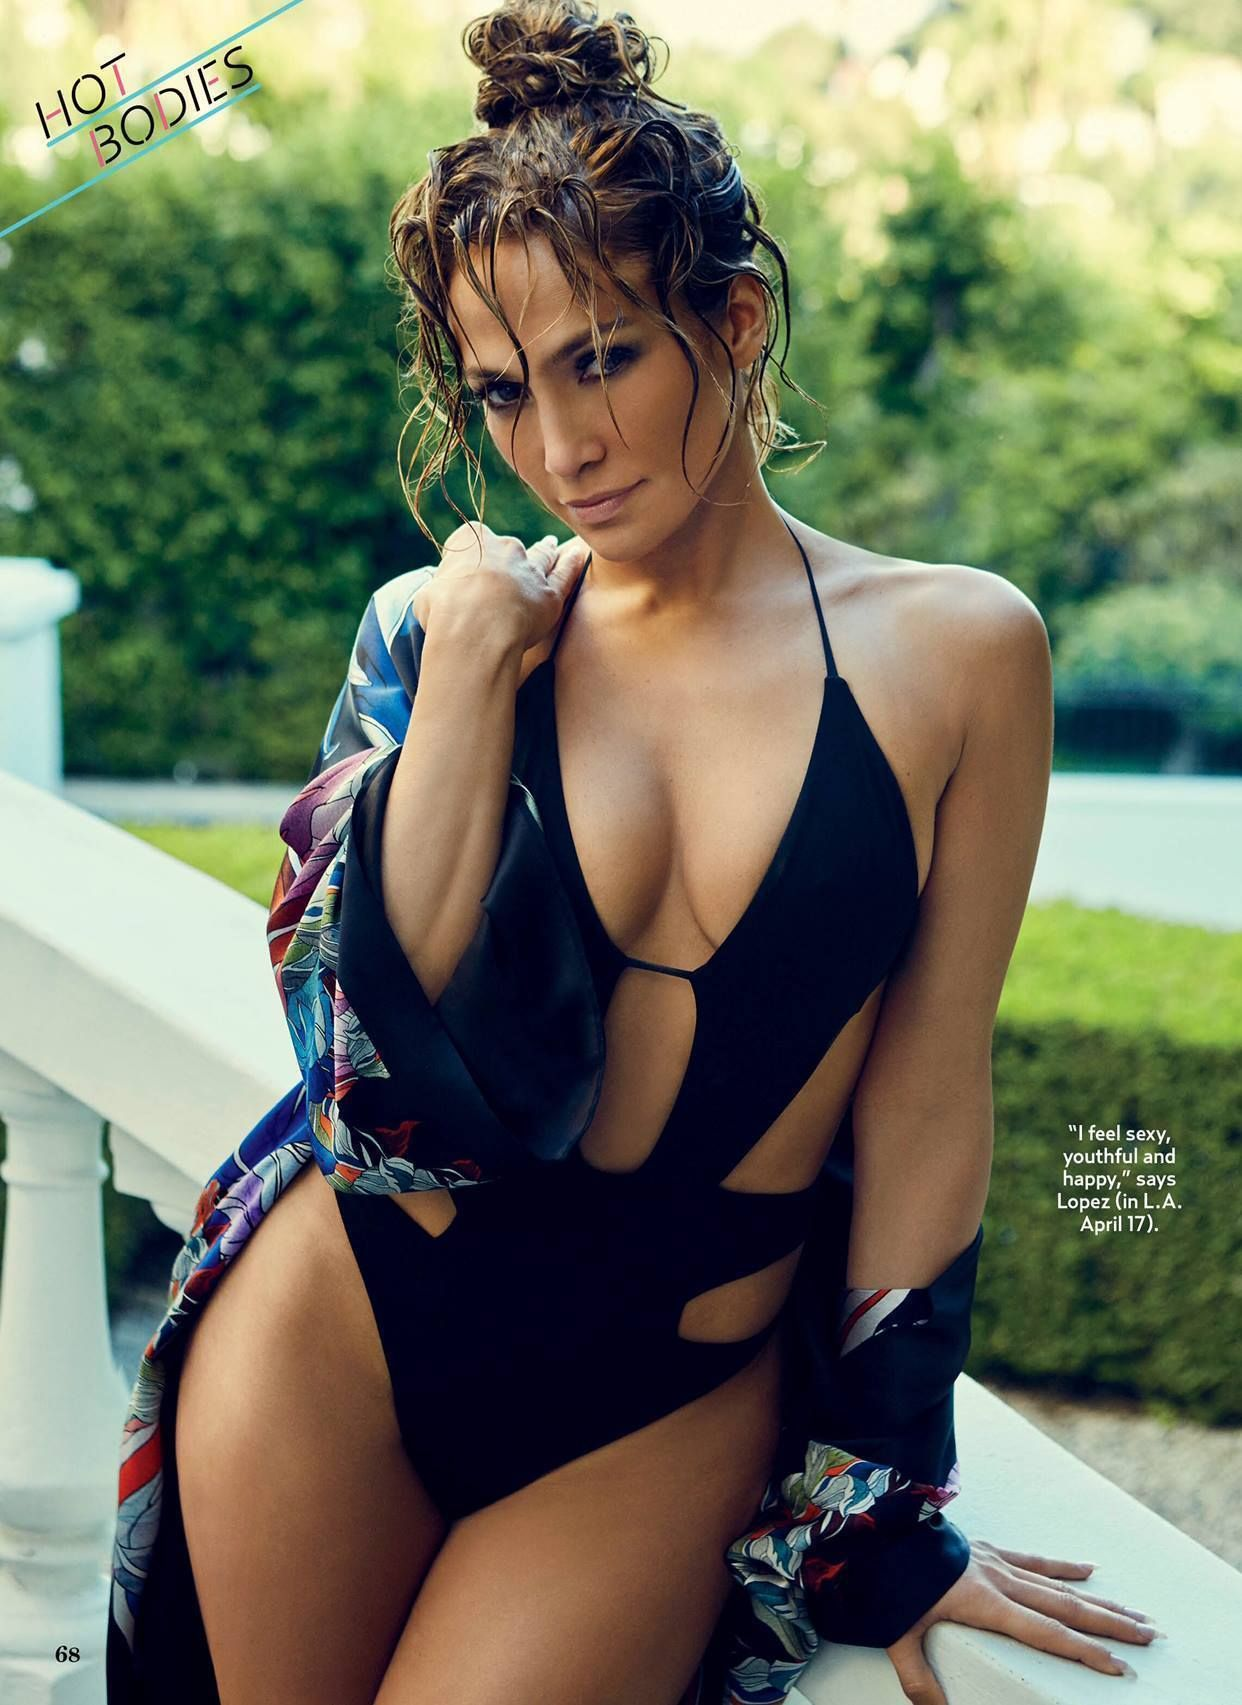 Jennifer Lopez Hot Ass Booty Boobs Sideboob Bikini Sexy Youthful Happy La Swimsuit June  Us Weekly Magazine The Best Bodies Issue Album On Imgur